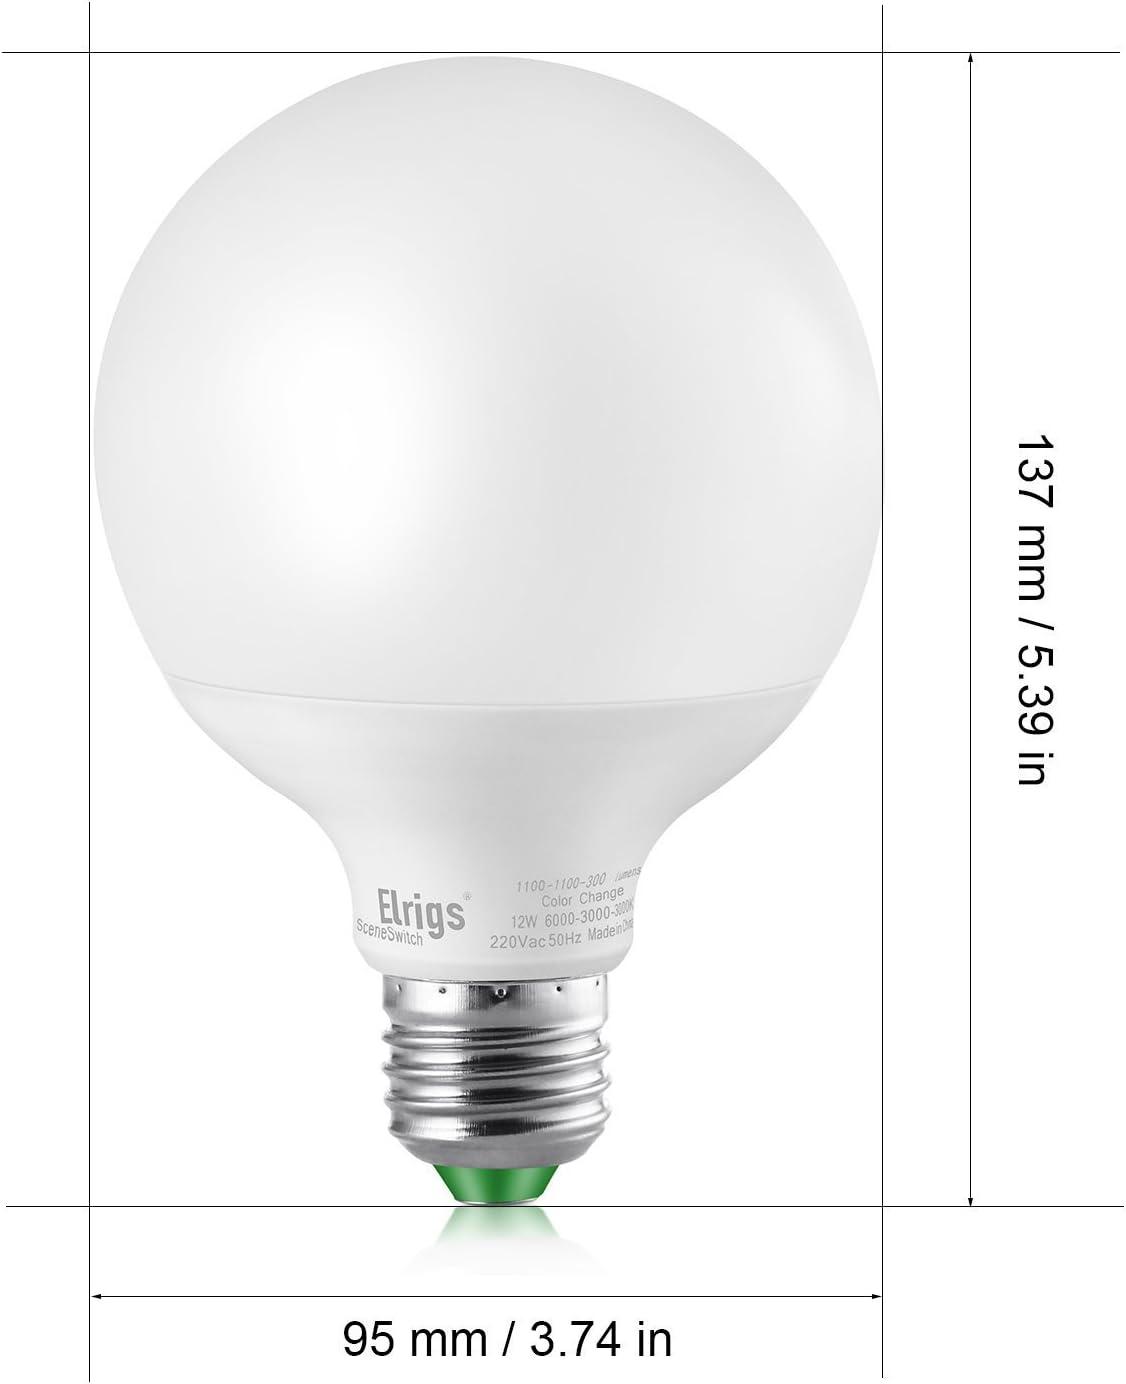 Elrigs 3 in 1 E27 Globe LED Lampe, Dimmen ohne Dimmer, 12W